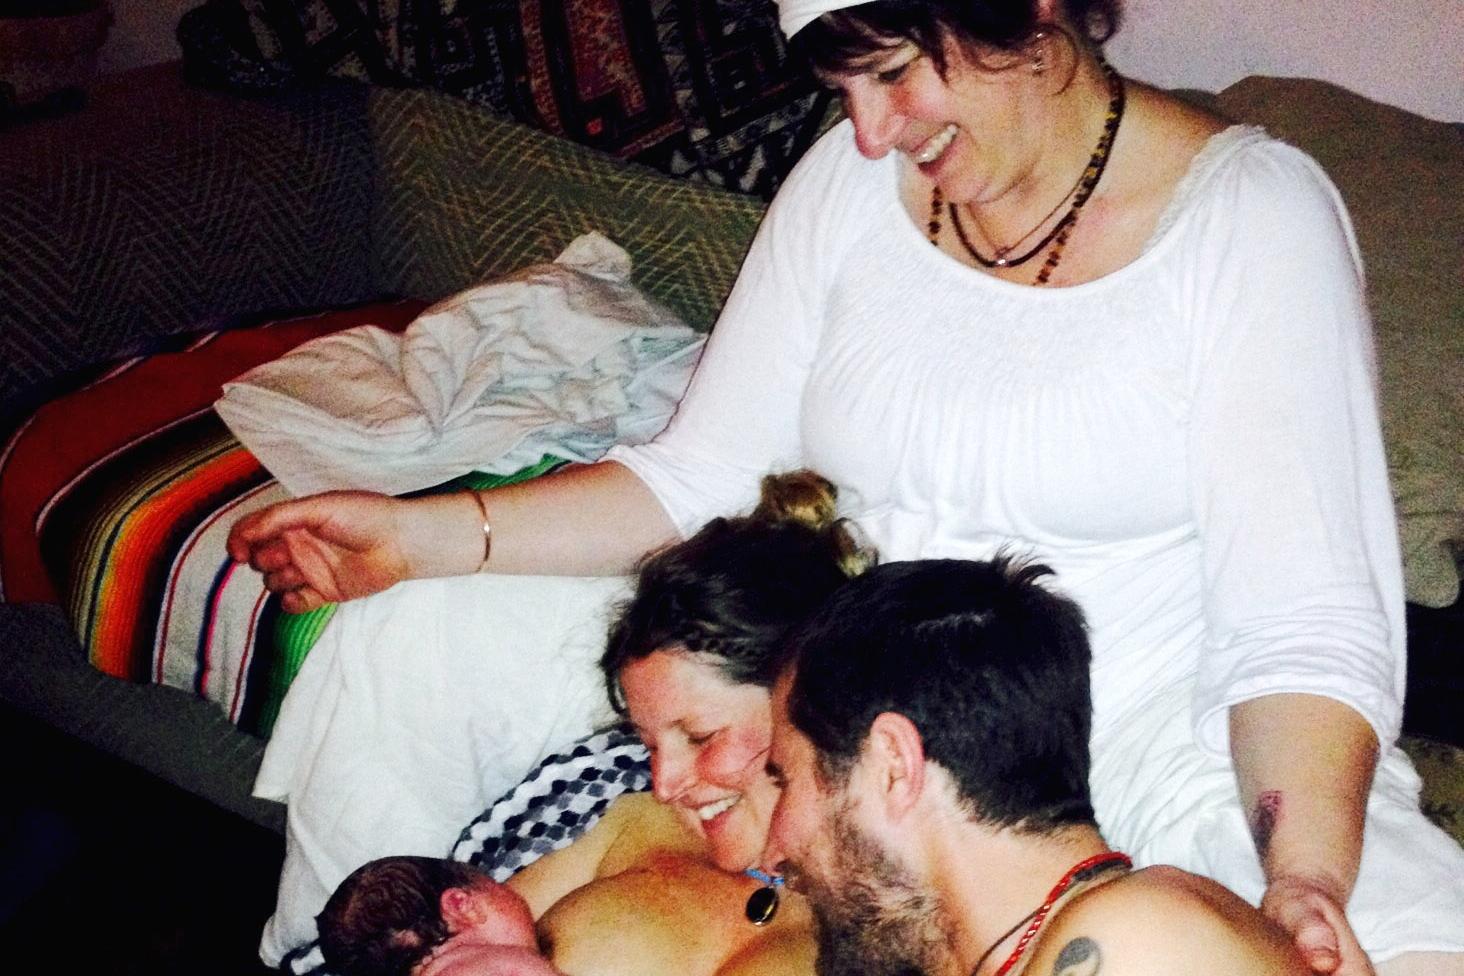 samsara doula at joyful homebirth.jpg